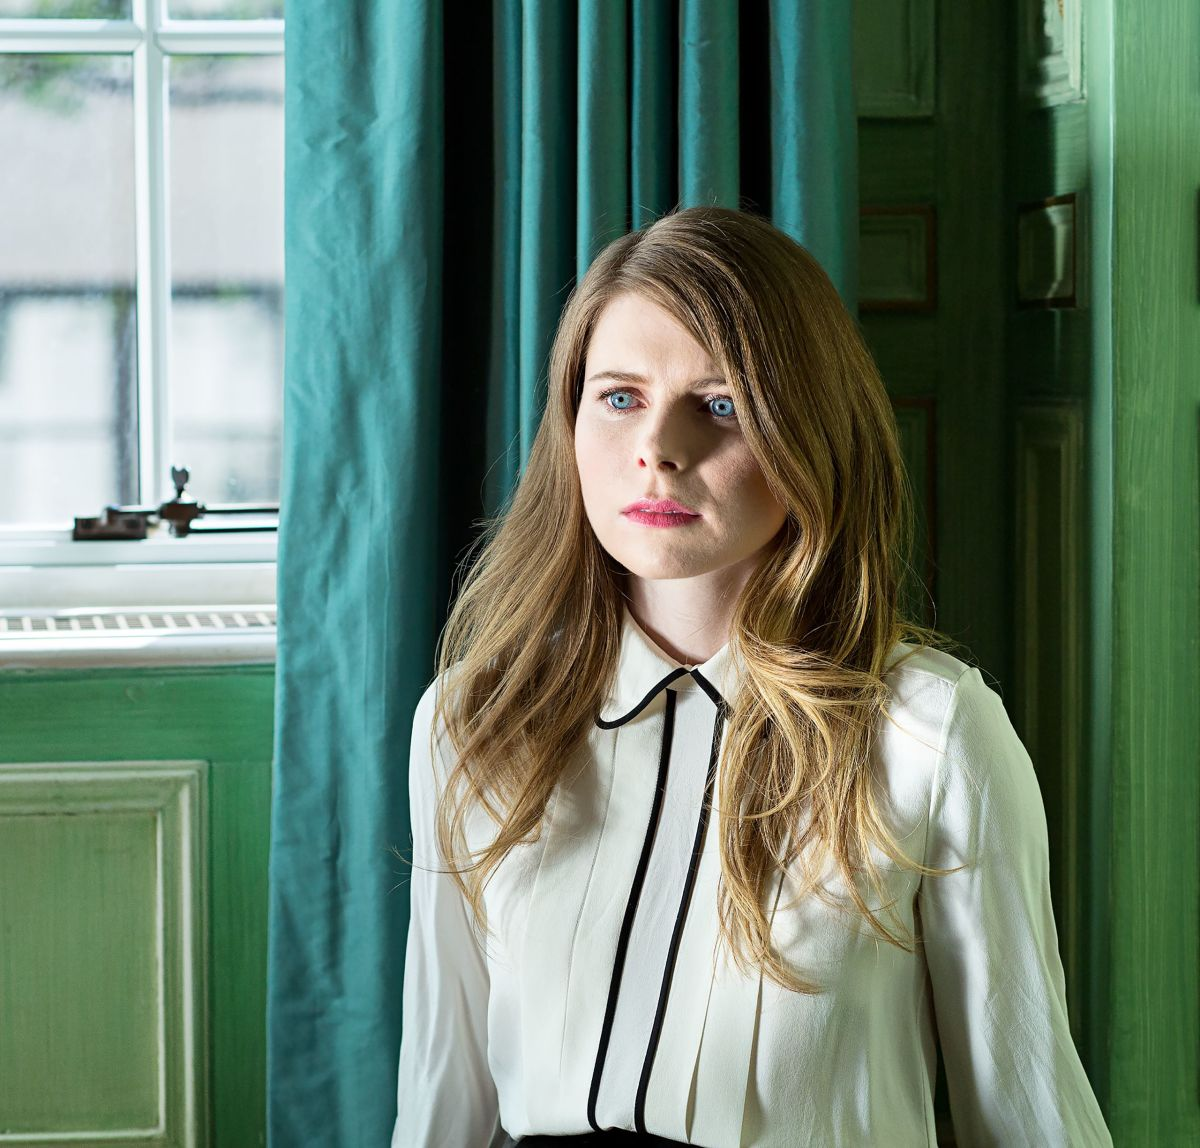 Portrait of Emma Cline, photo via Huffpost